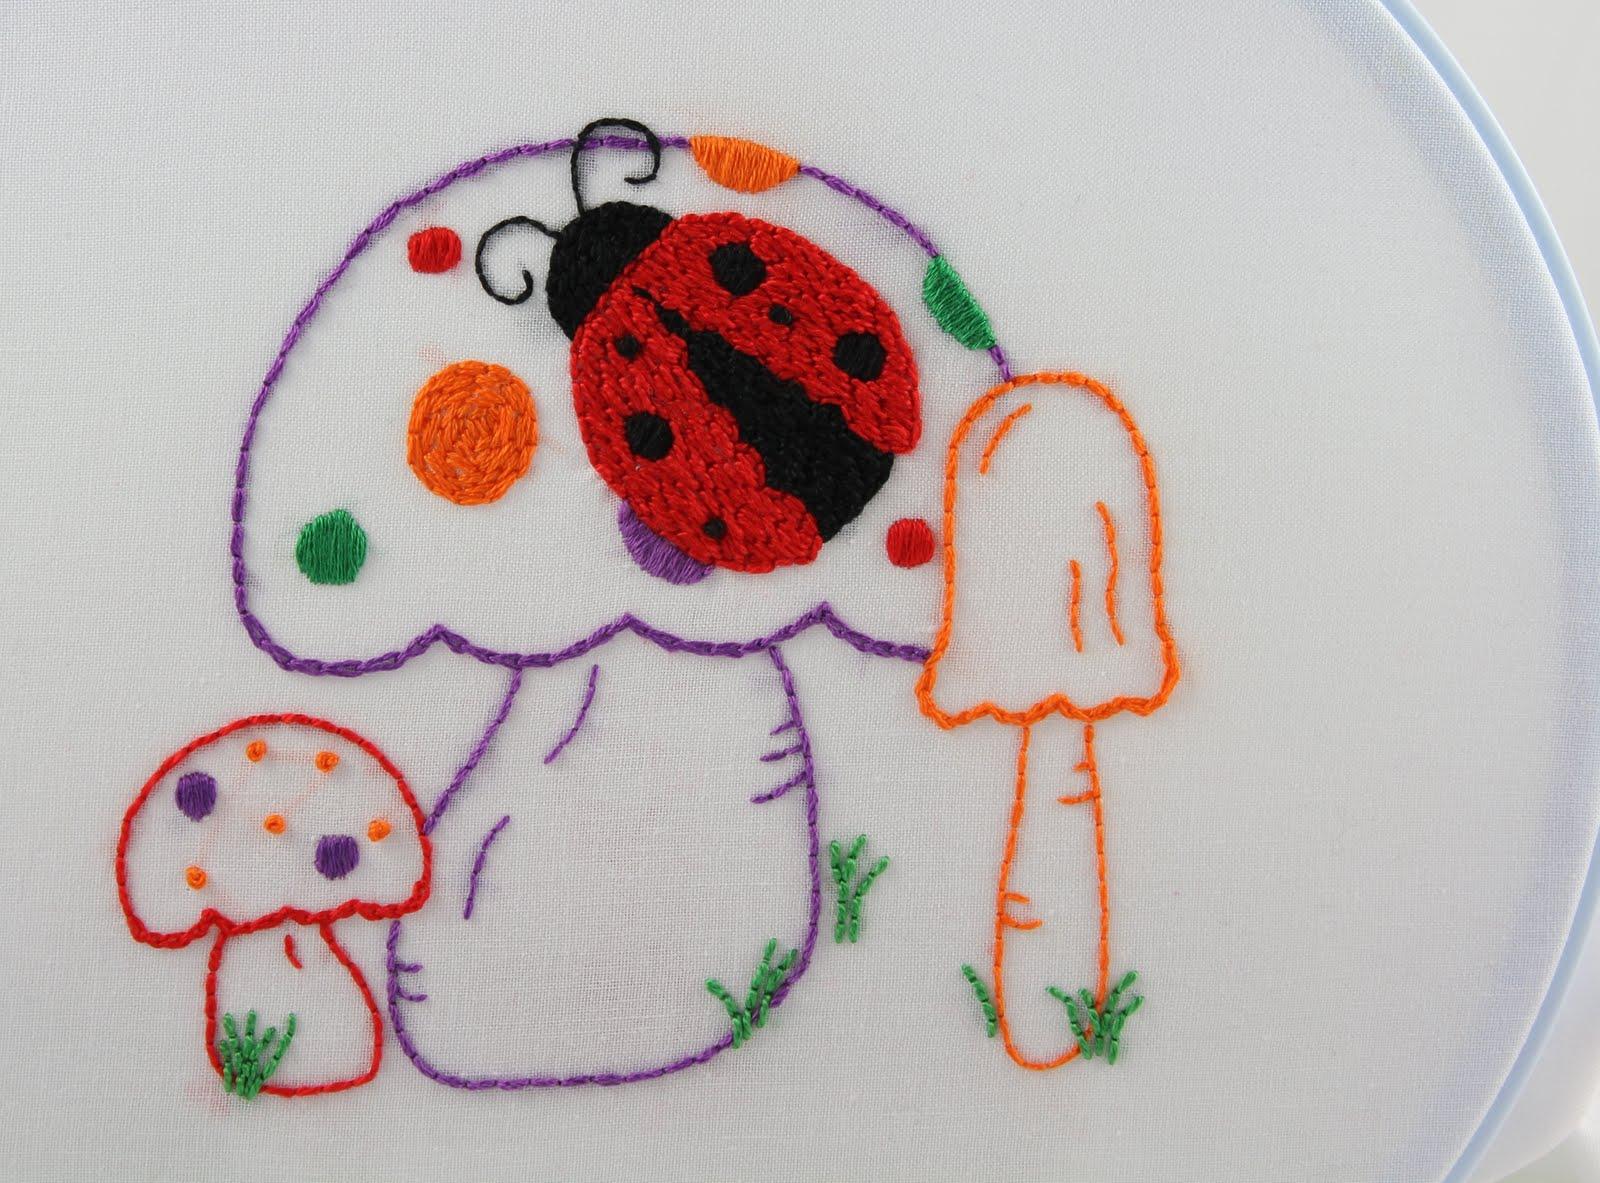 Big b ladybug embroidery pattern packet ladybug embroidery pattern packet bankloansurffo Image collections